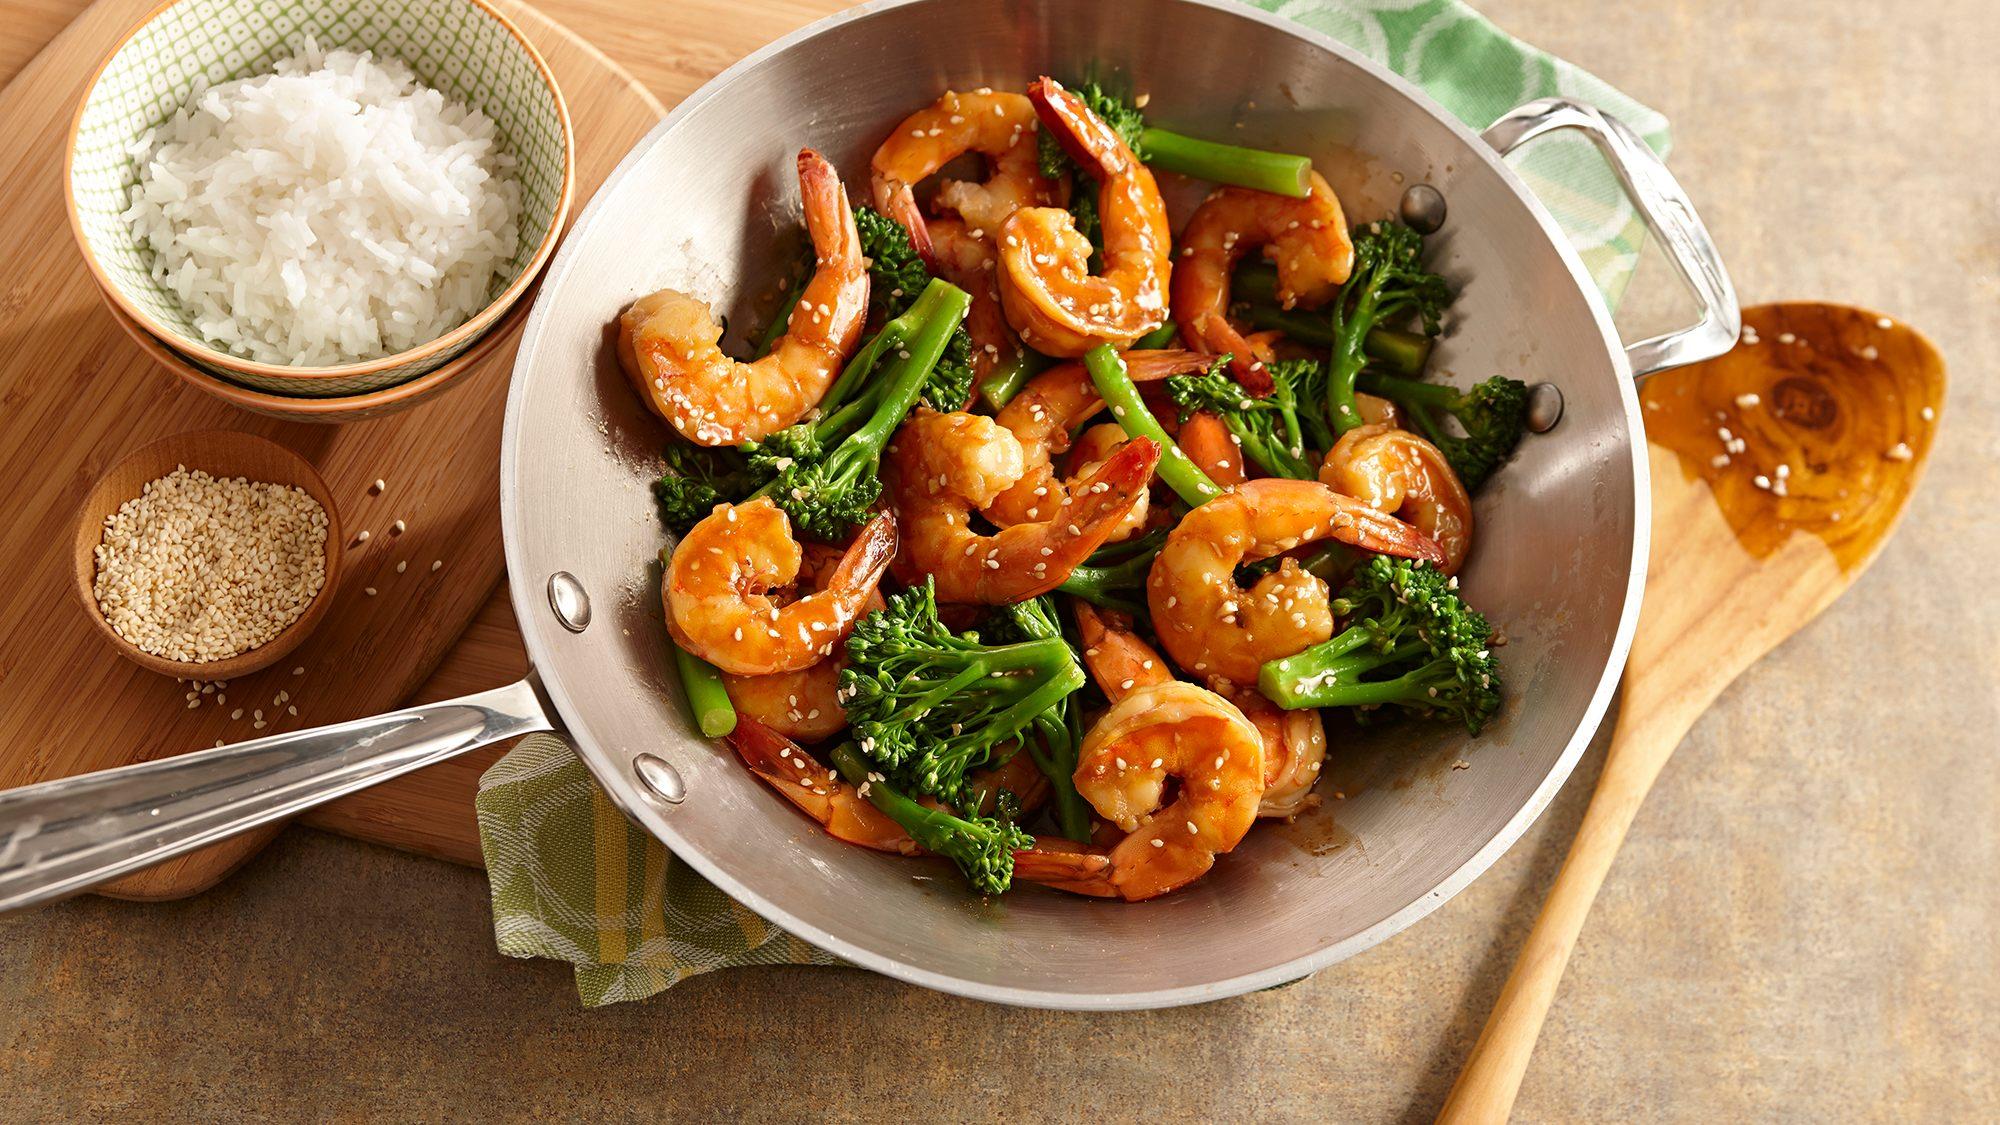 shrimp-and-broccolini-stir-fry.jpg